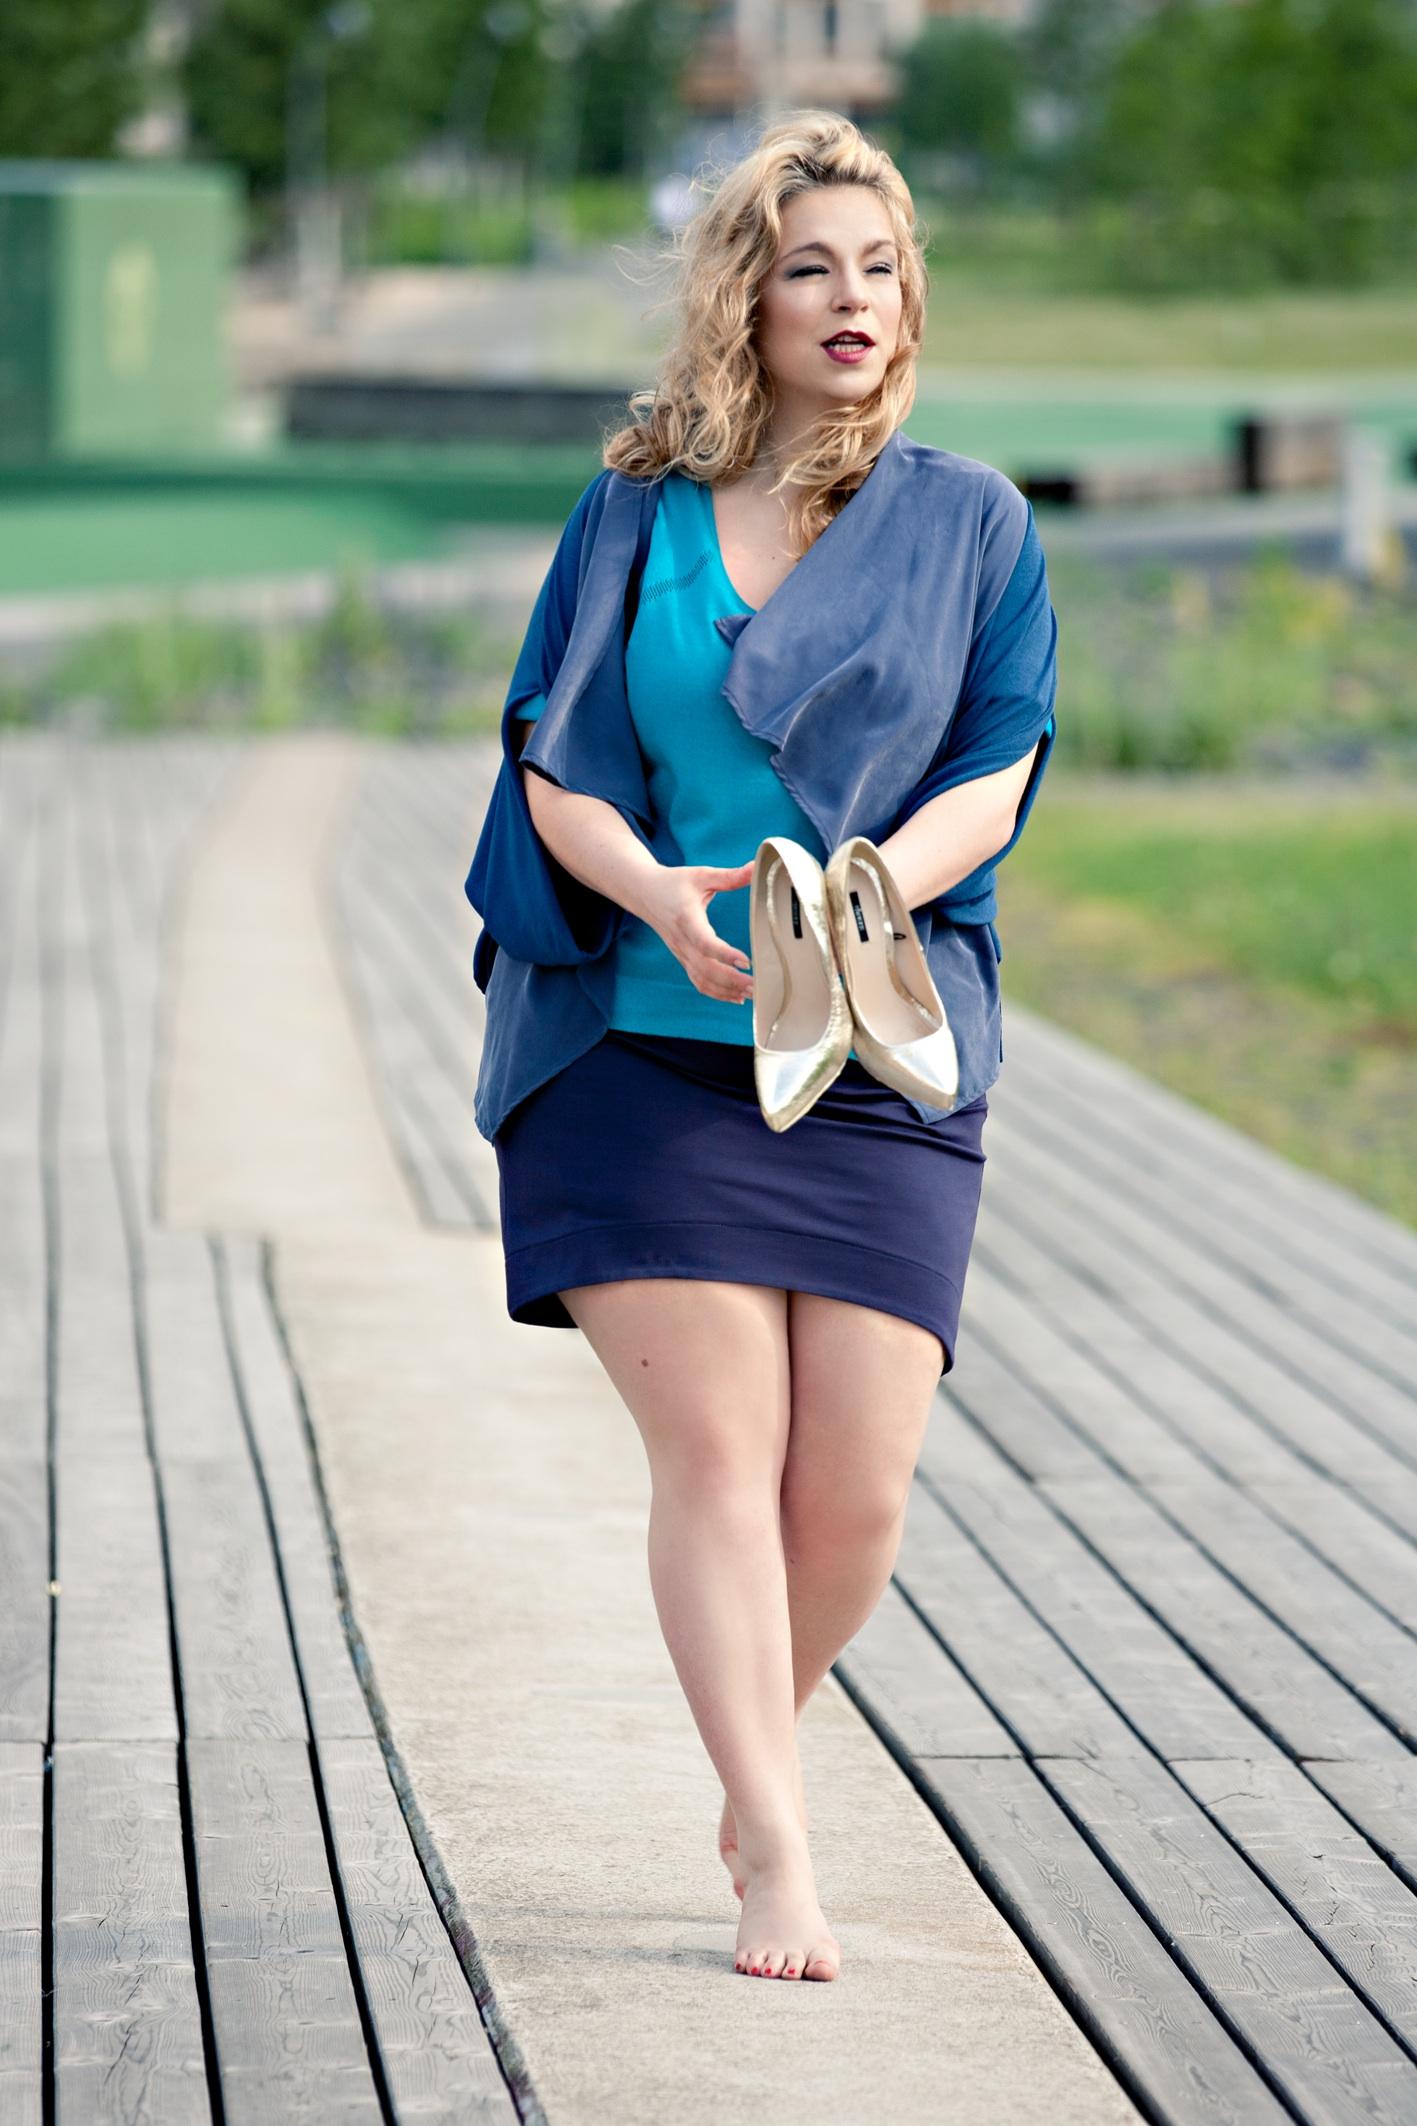 Plussizemodel-Caterina-pogorzelski-curvy-campaign-Deutsches-Model-Plussizeblogger